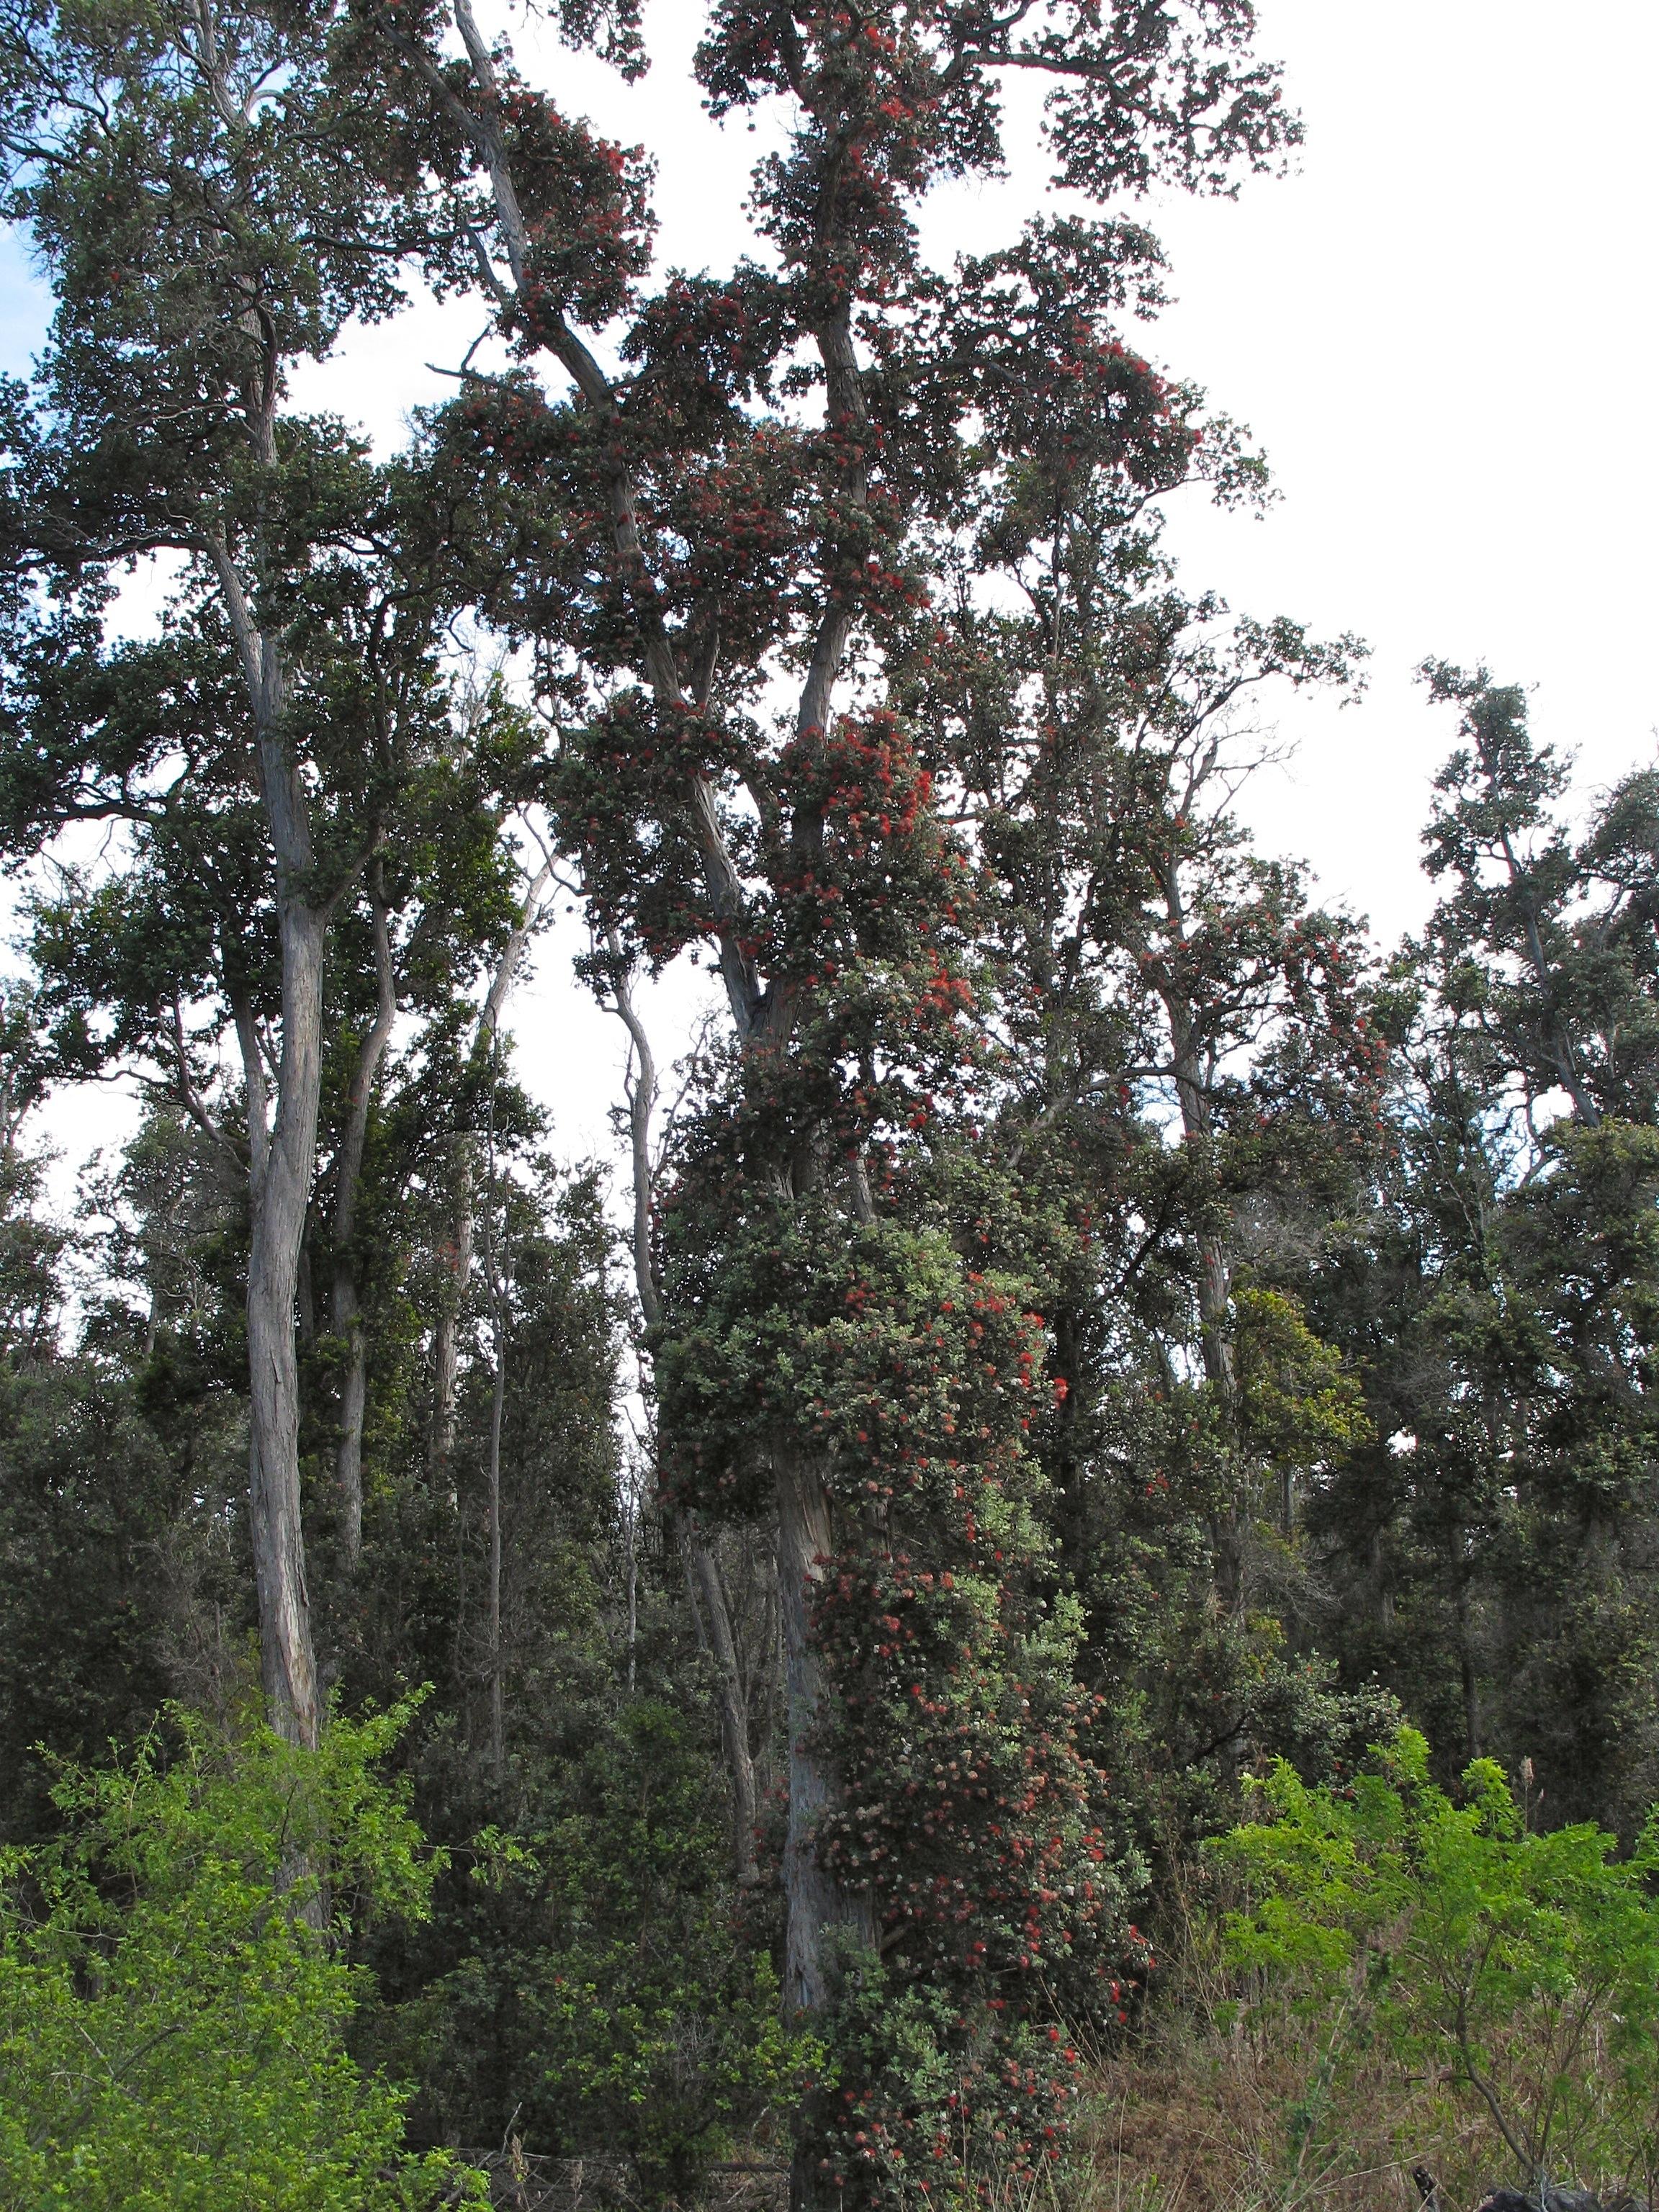 Ohia Tree Blossom Pictures Photographs Barren Lava